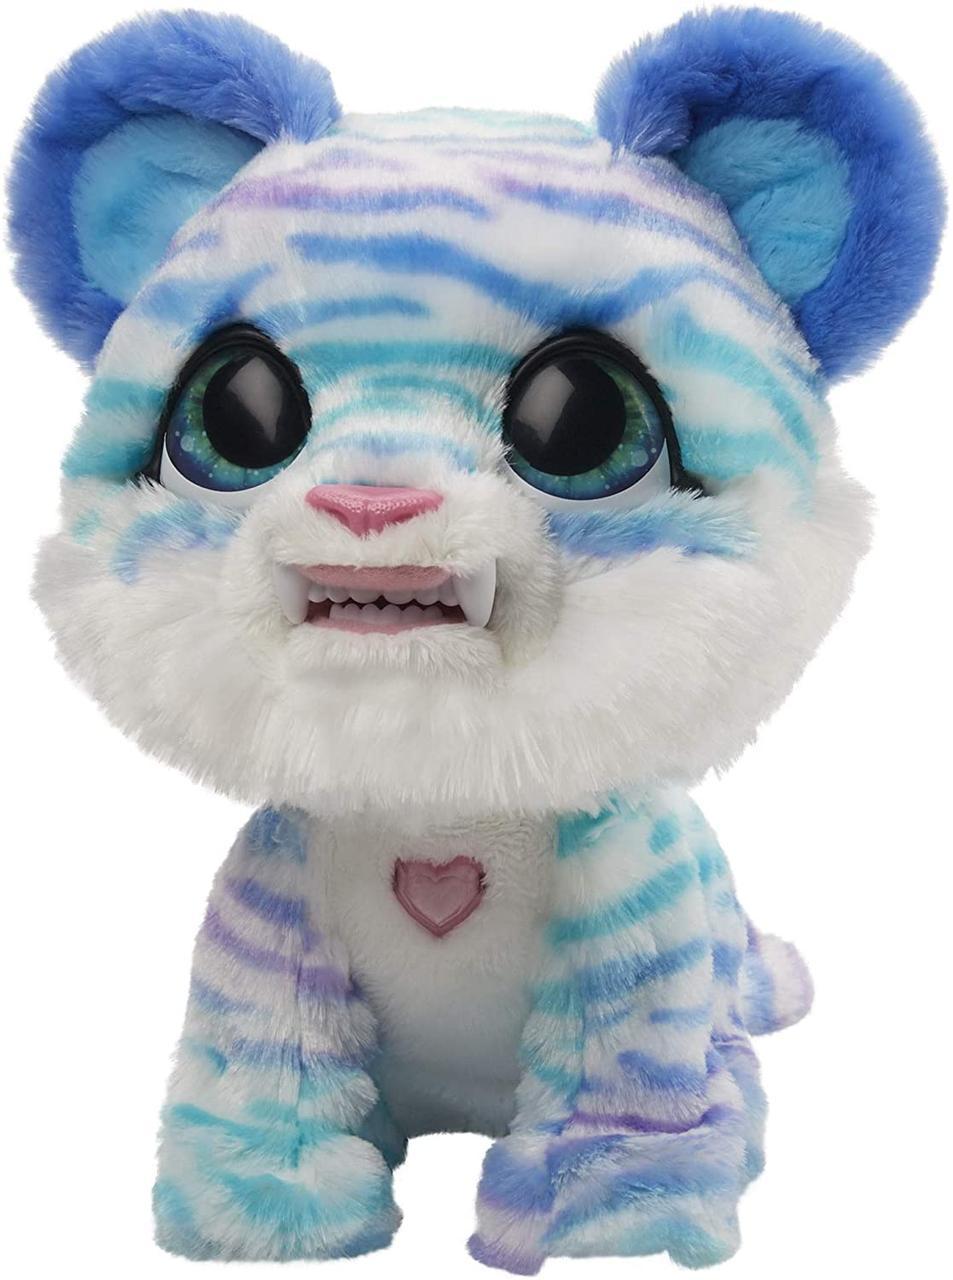 Интерактивный Саблезубый тигренок Норт furReal North The Sabertooth Kitty Interactive Plush Pet Toy